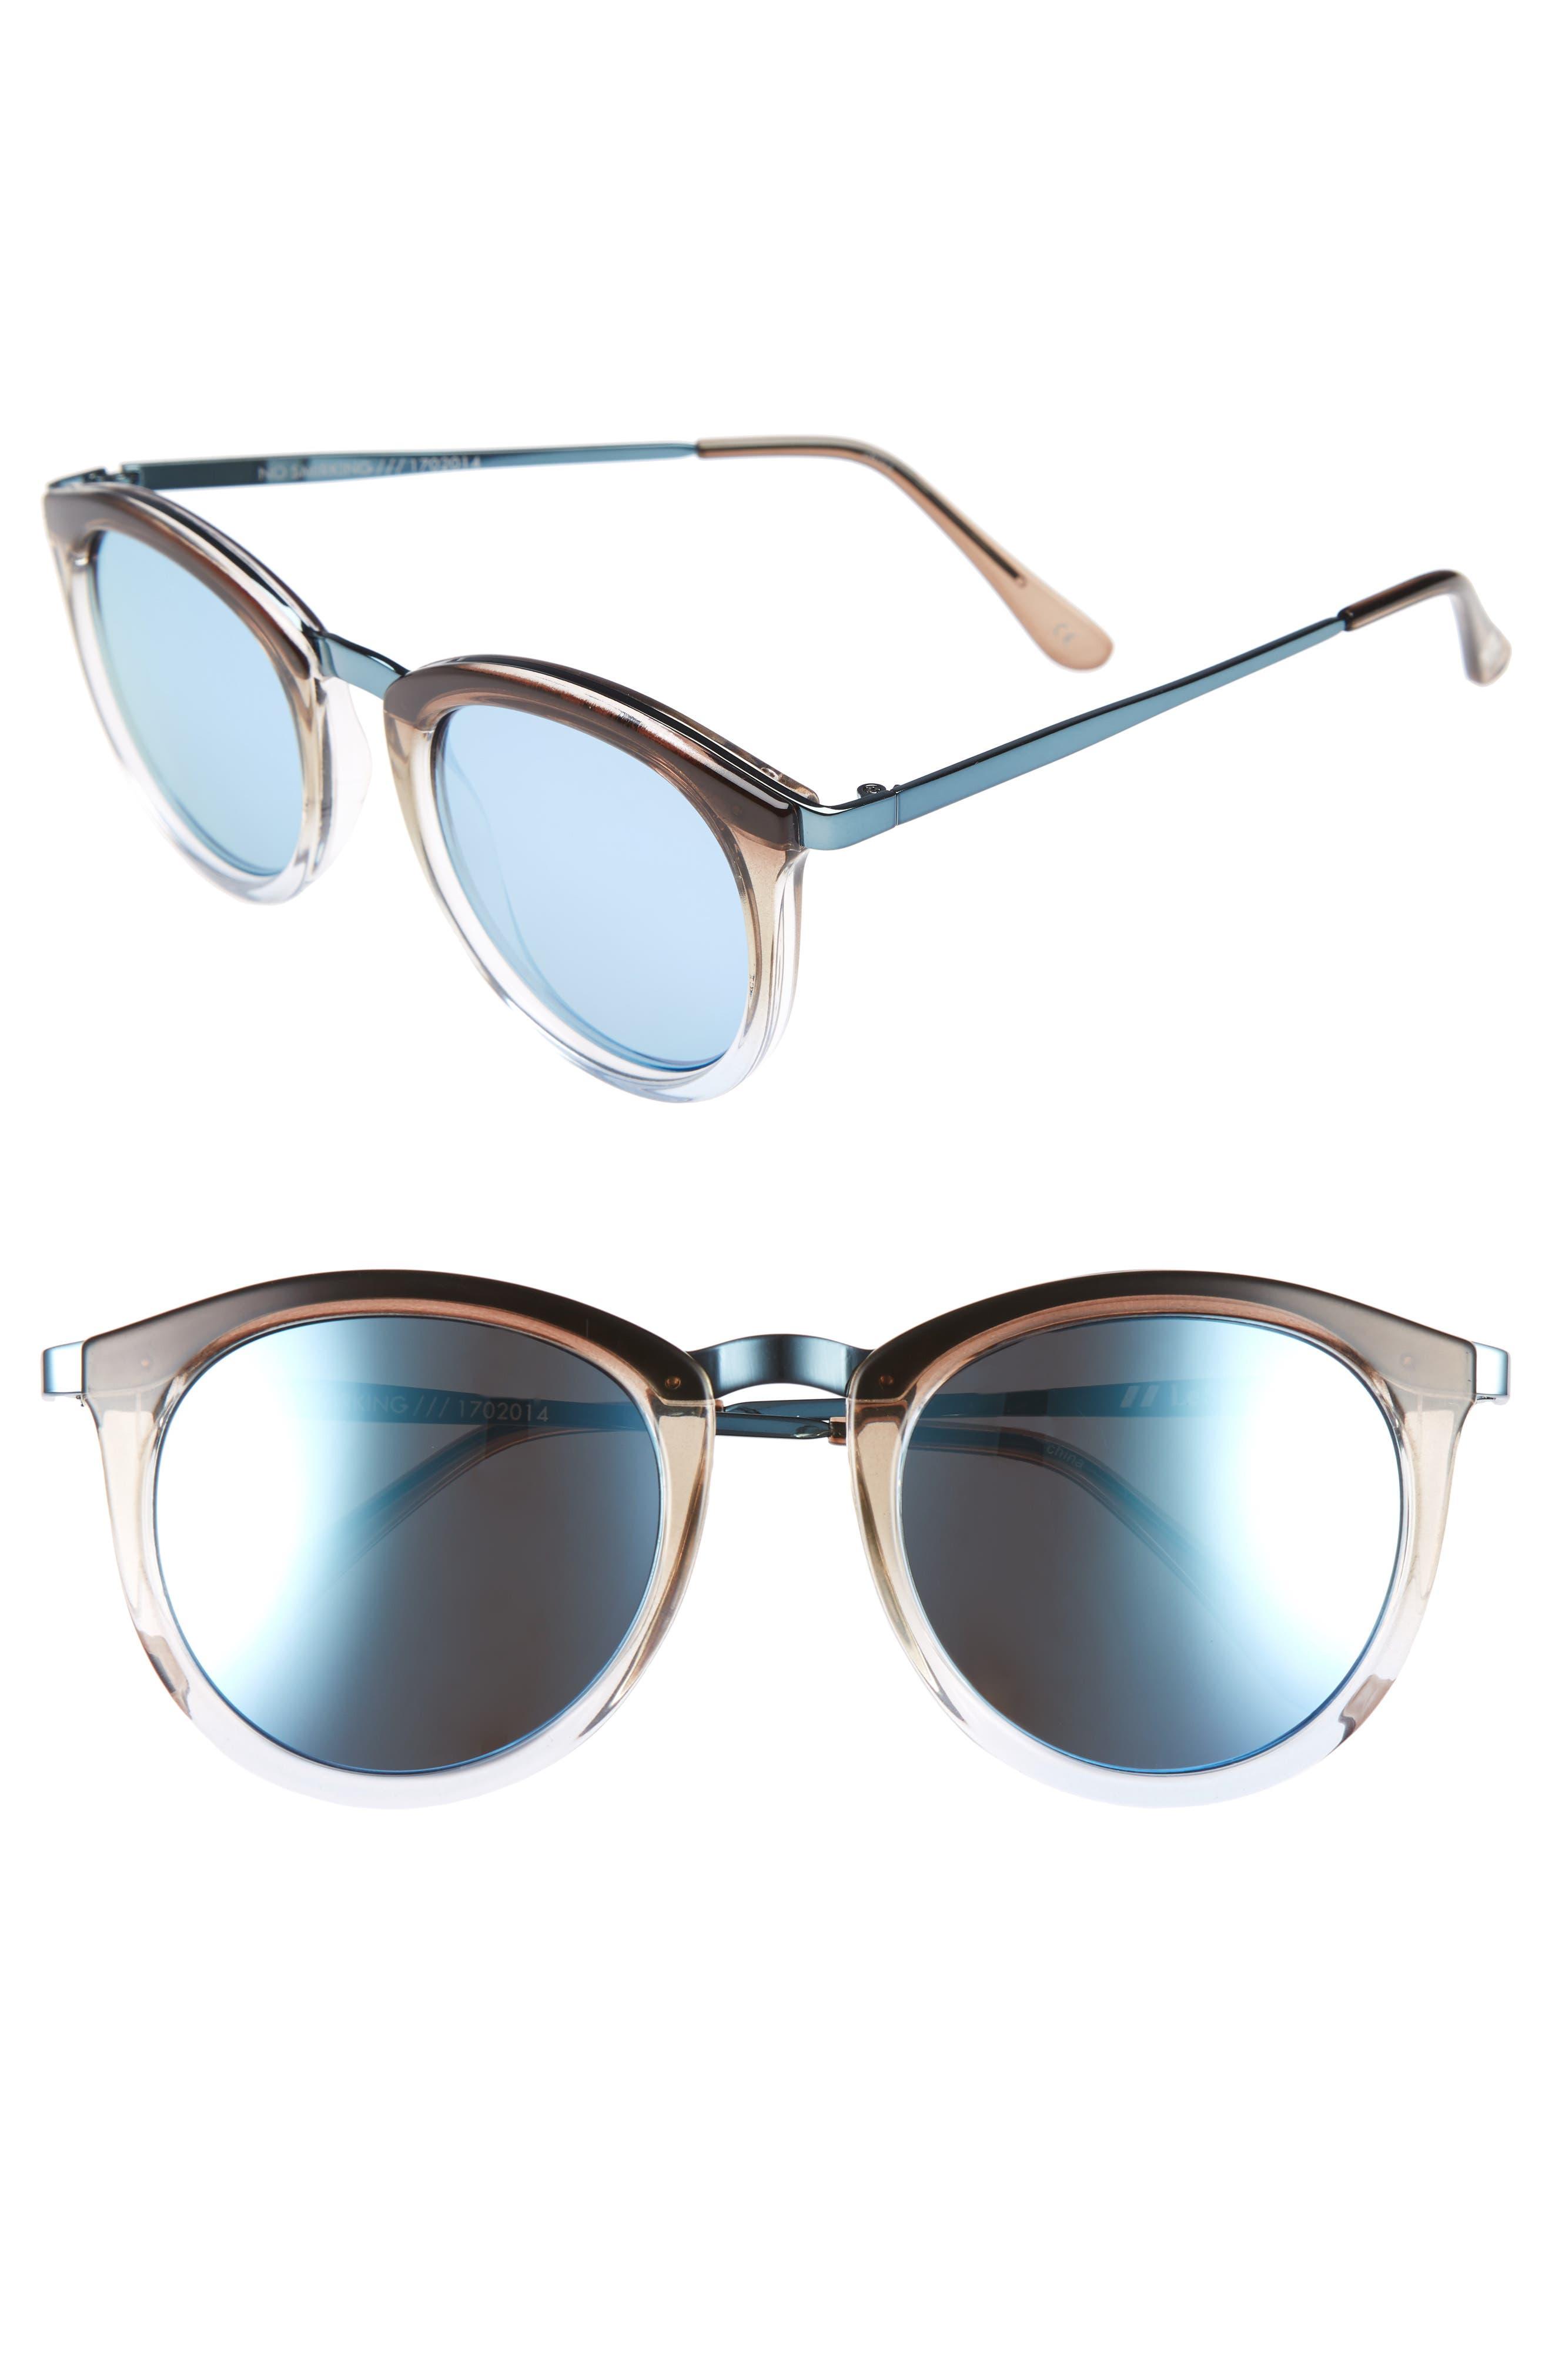 Main Image - Le Specs No Smirking Limited 50mm Sunglasses